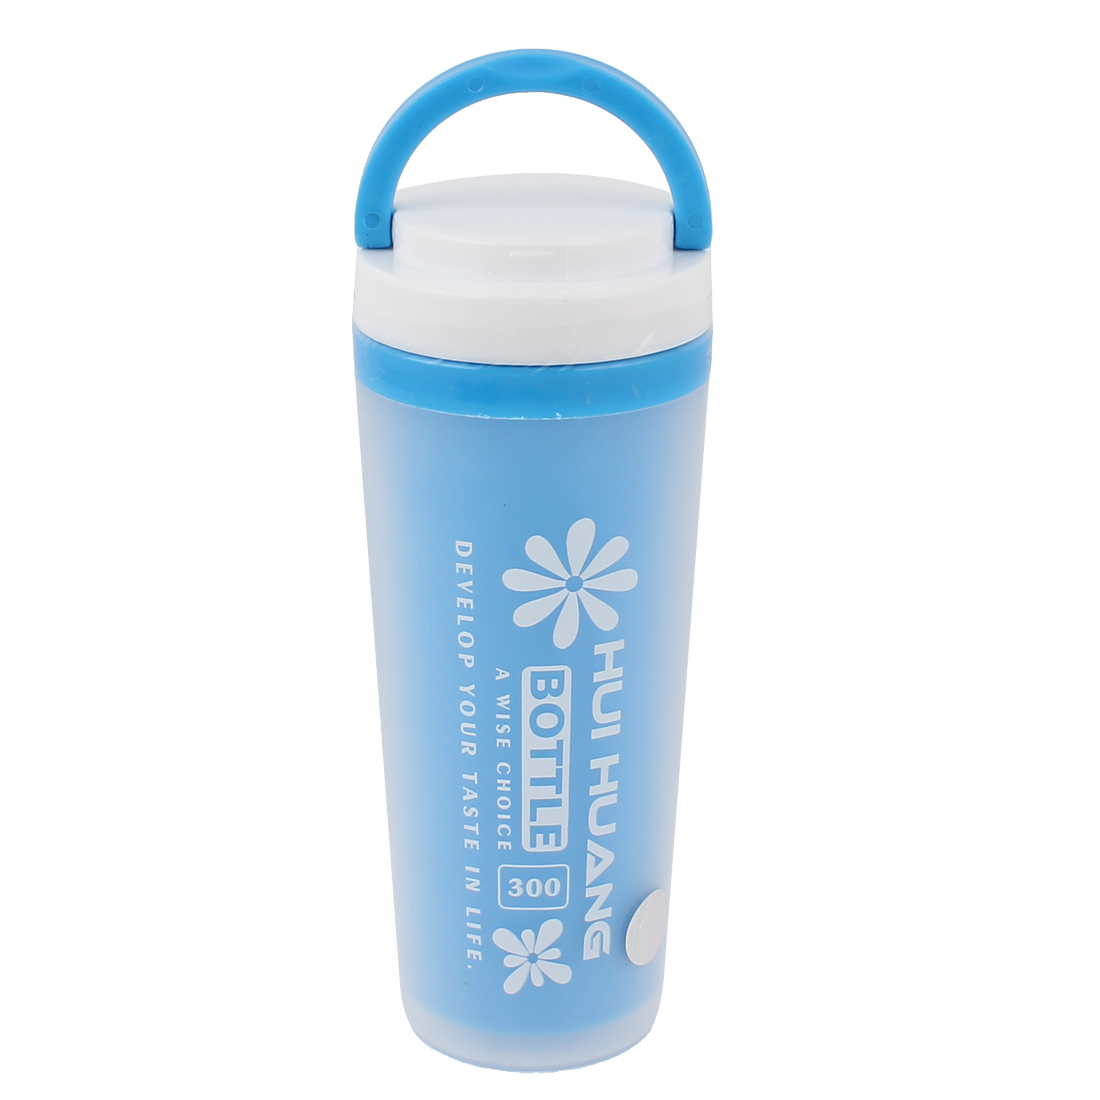 300ml Tea Water Vacuum Flask Insulated Insulating Bottle Travel Mug Blue